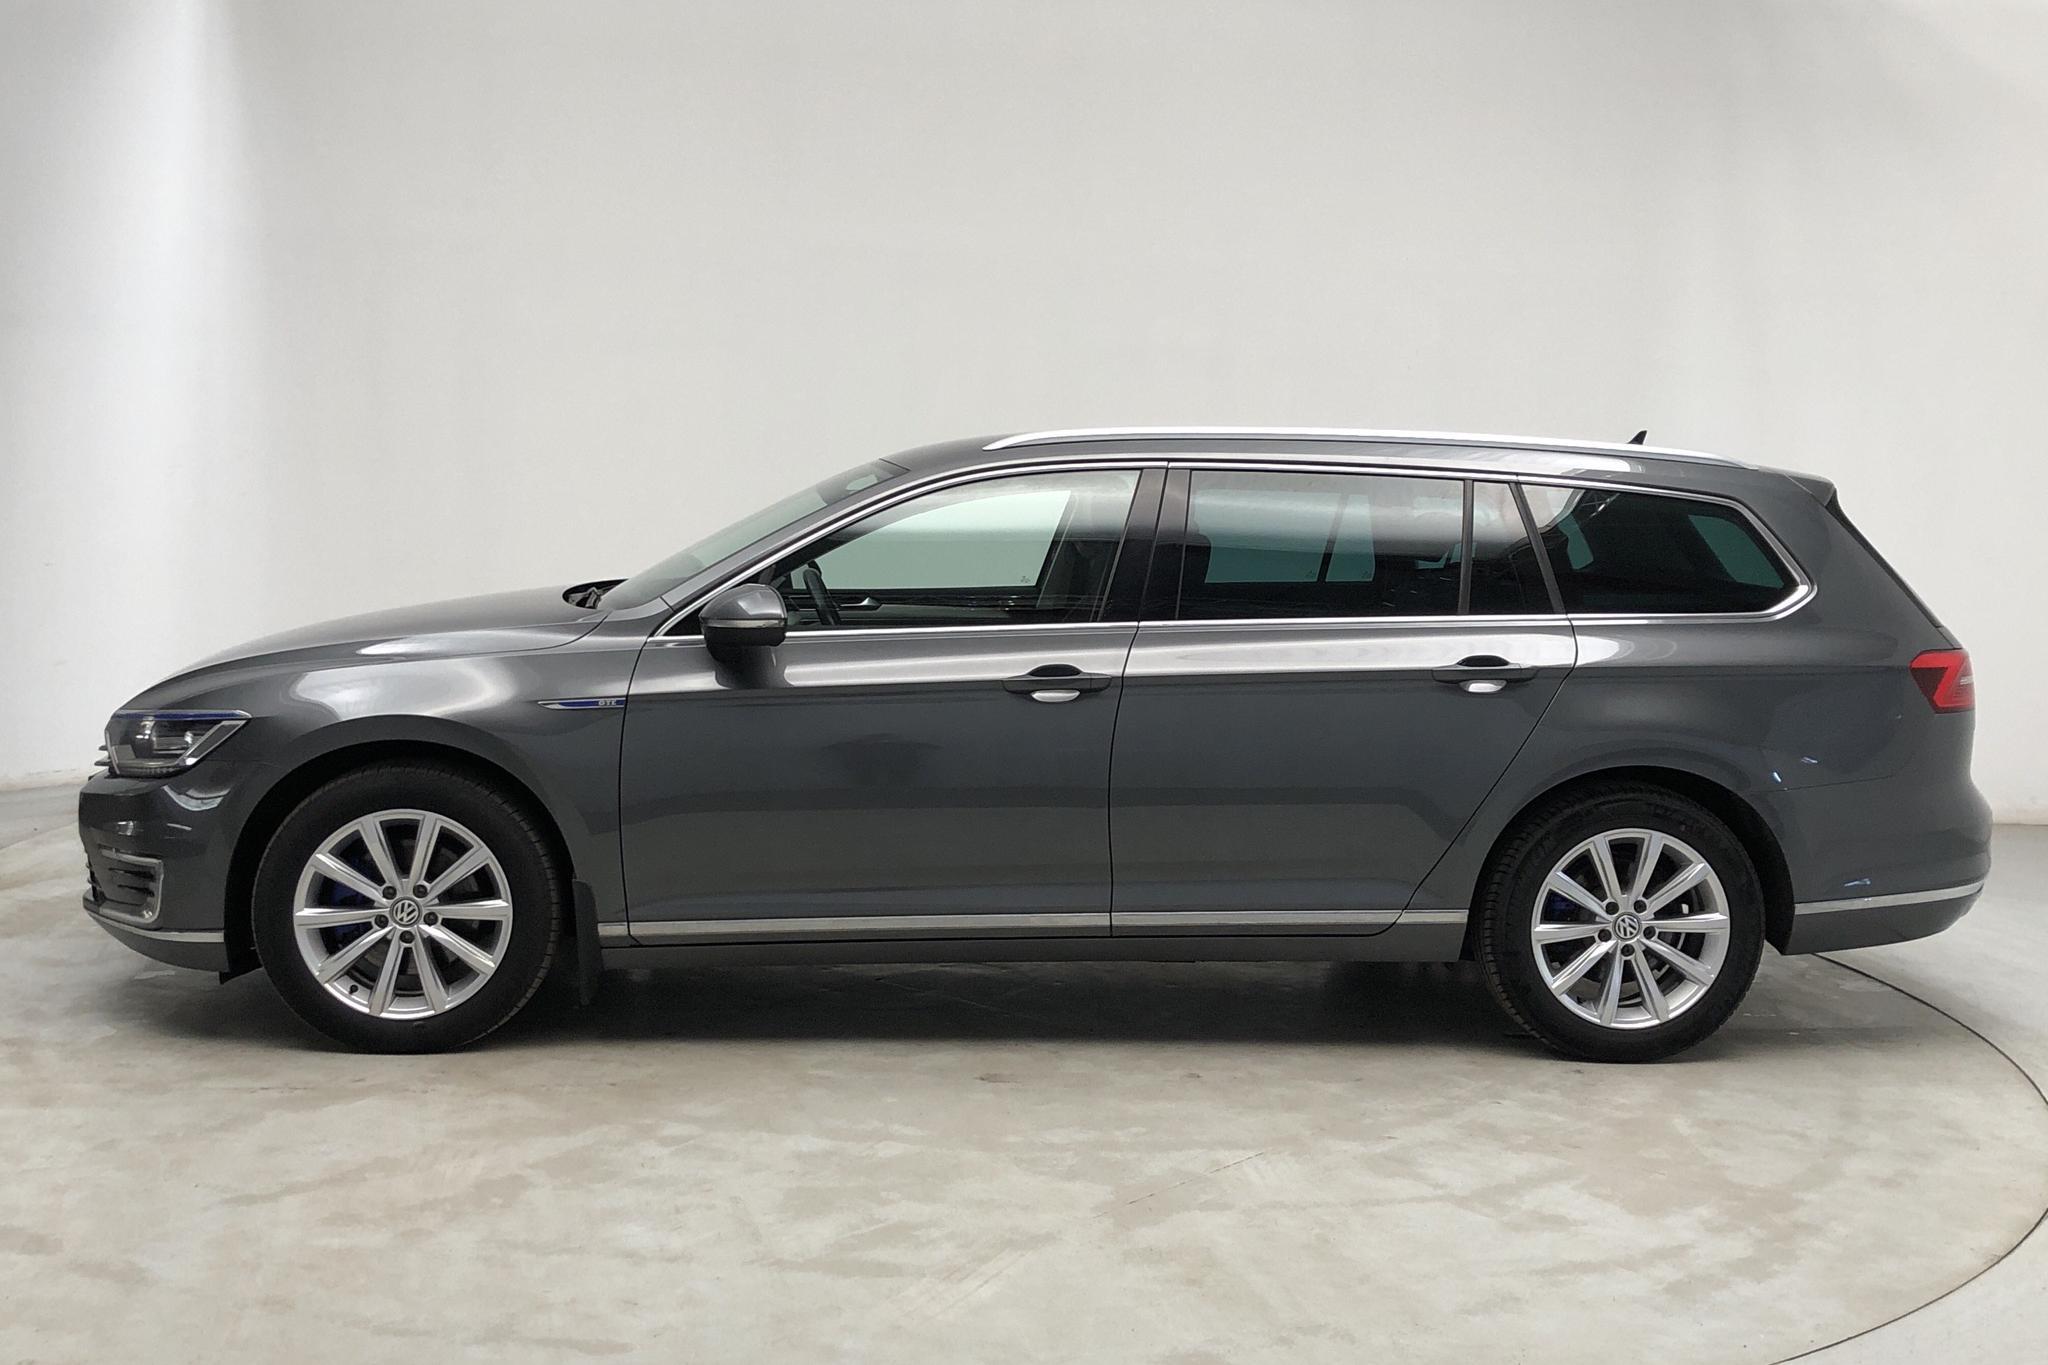 VW Passat 1.4 Plug-in-Hybrid Sportscombi (218hk) - 119 000 km - Automatic - Dark Grey - 2017